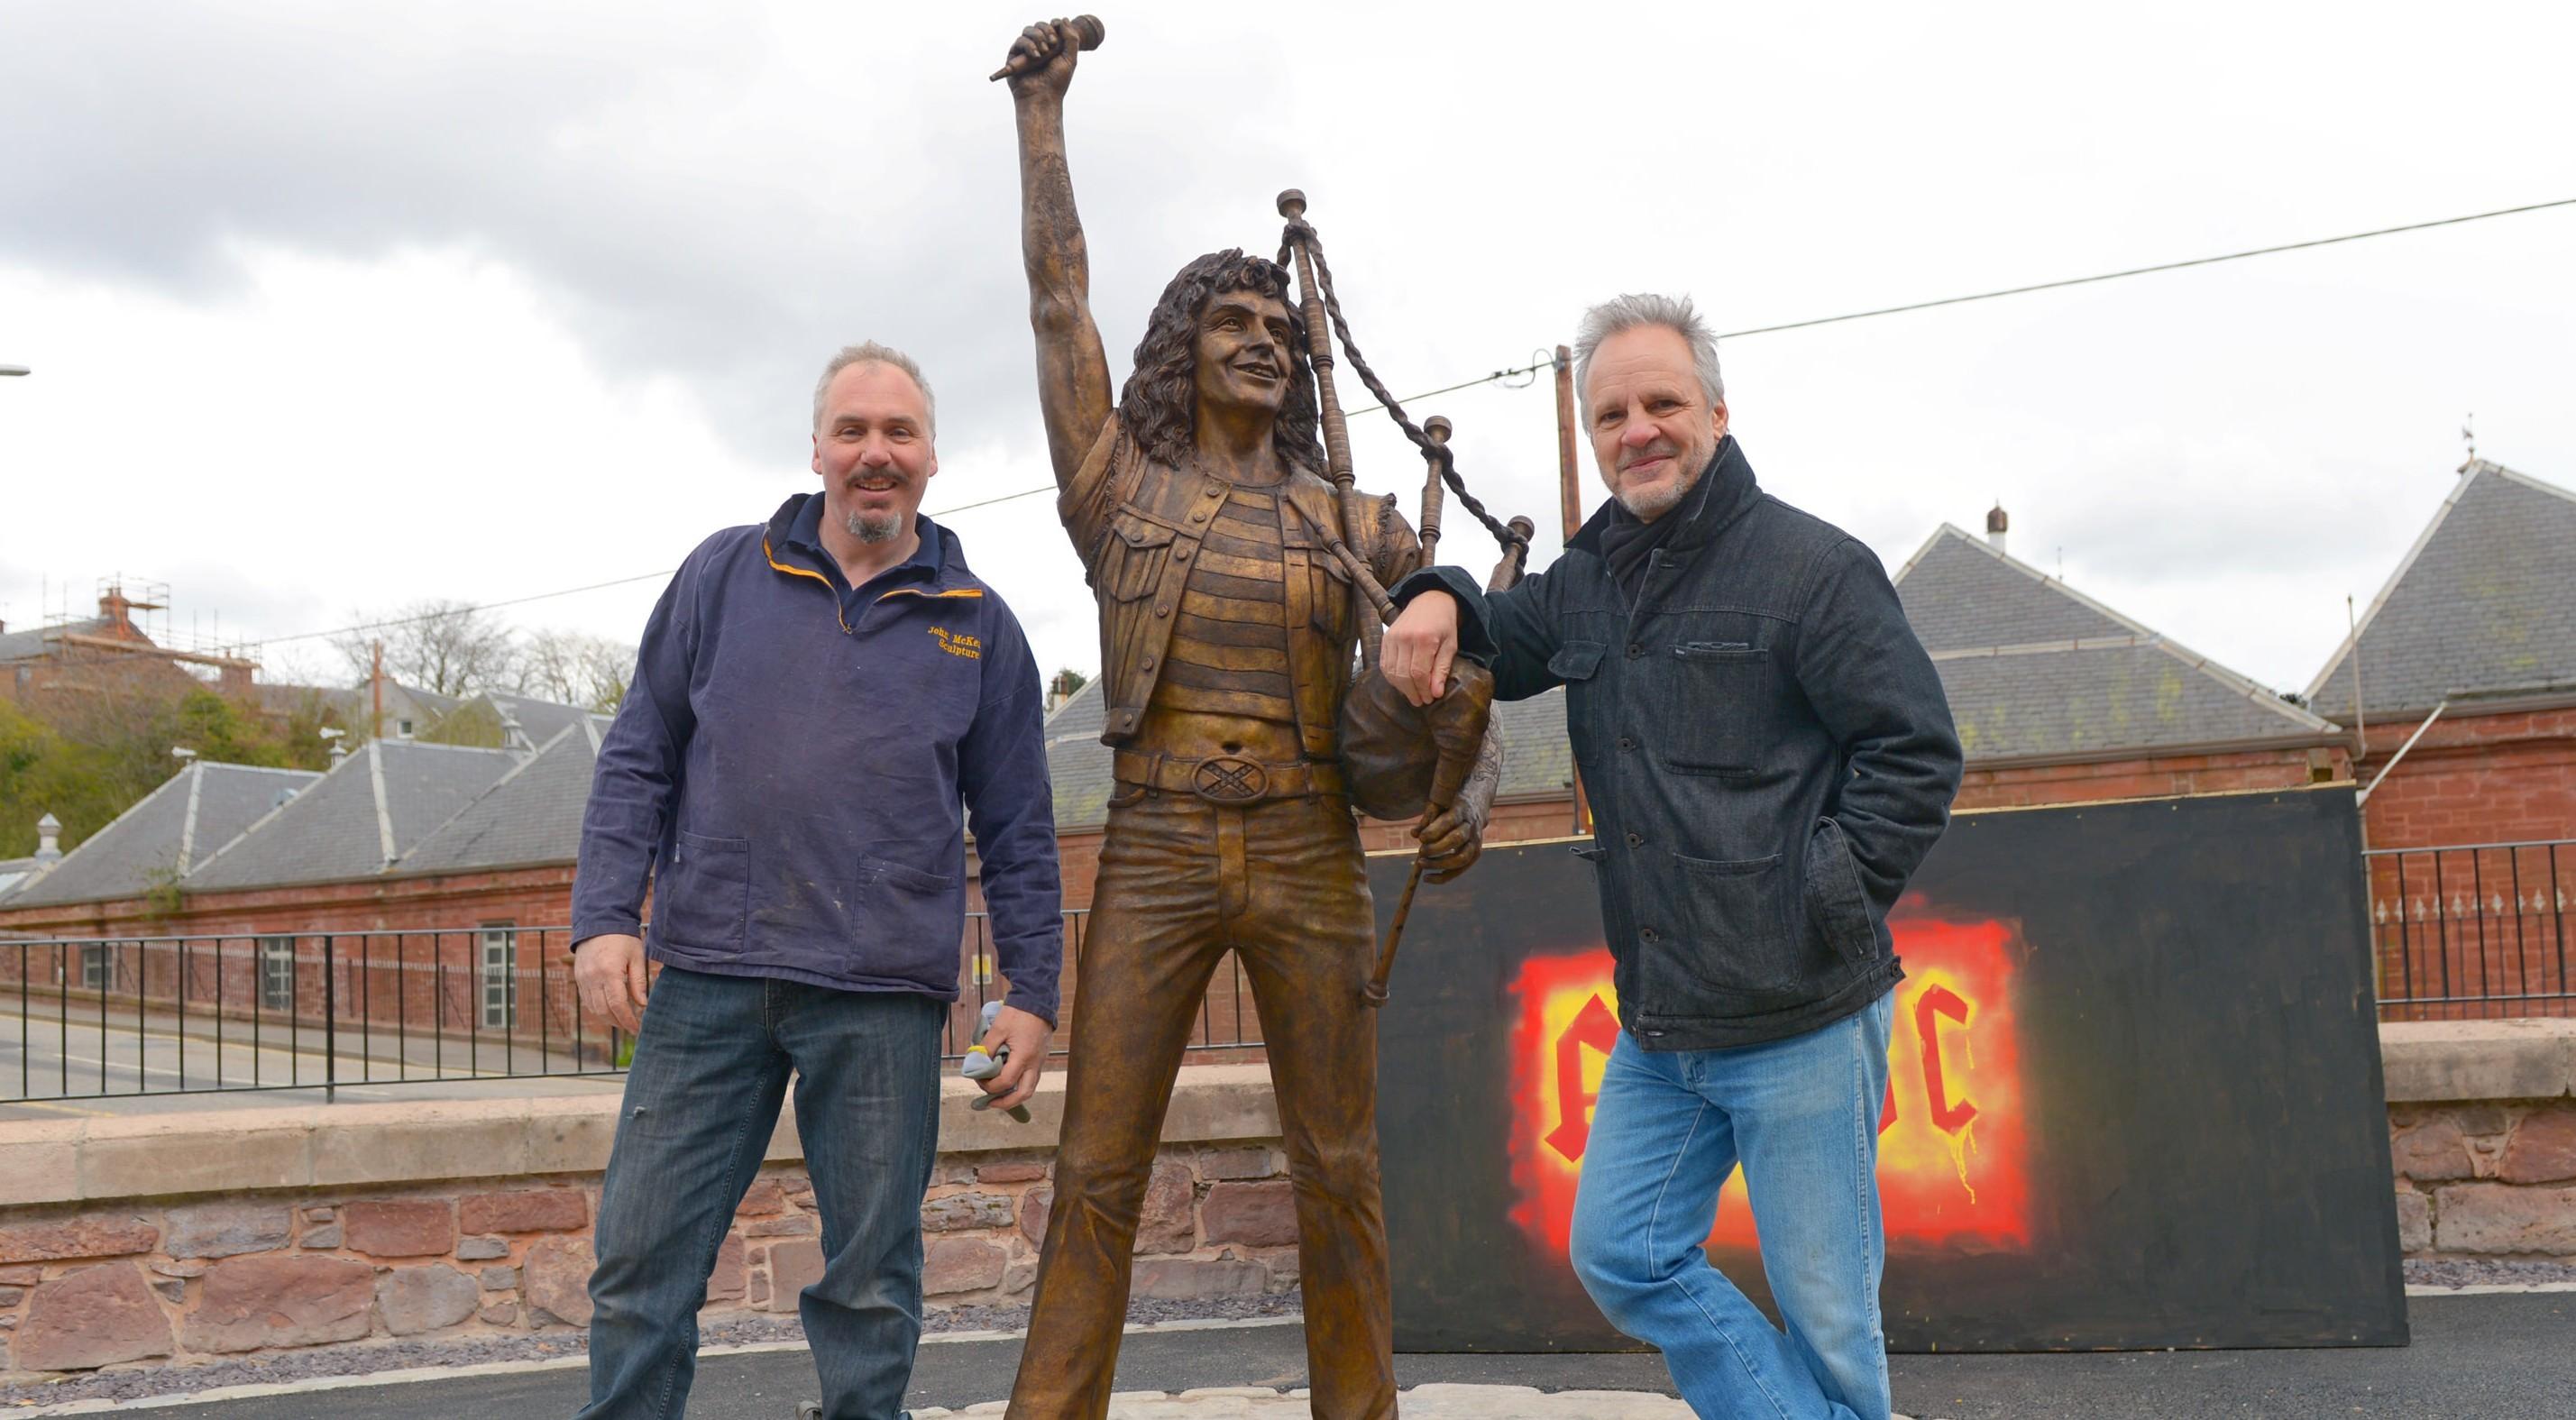 Sculptor John McKenna (left) with Mark Evans, former AC/DC bass player